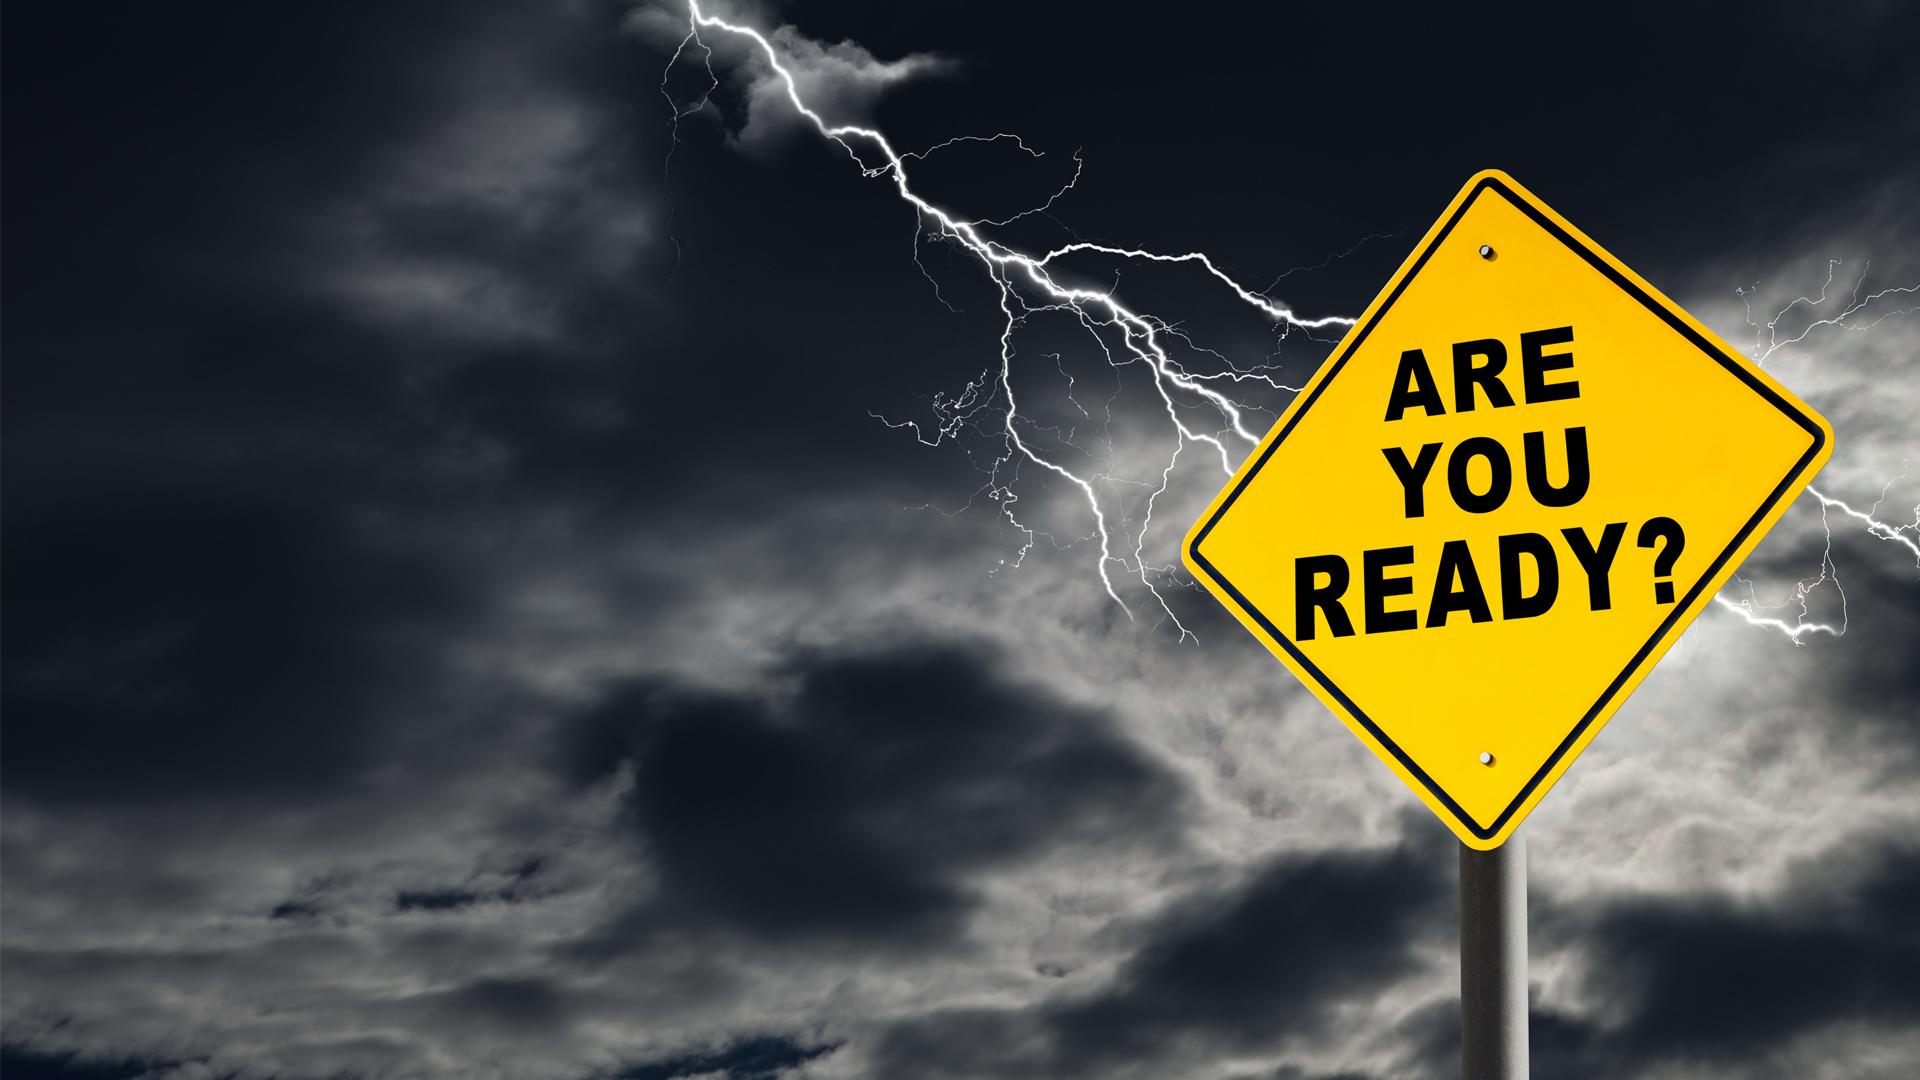 storm header